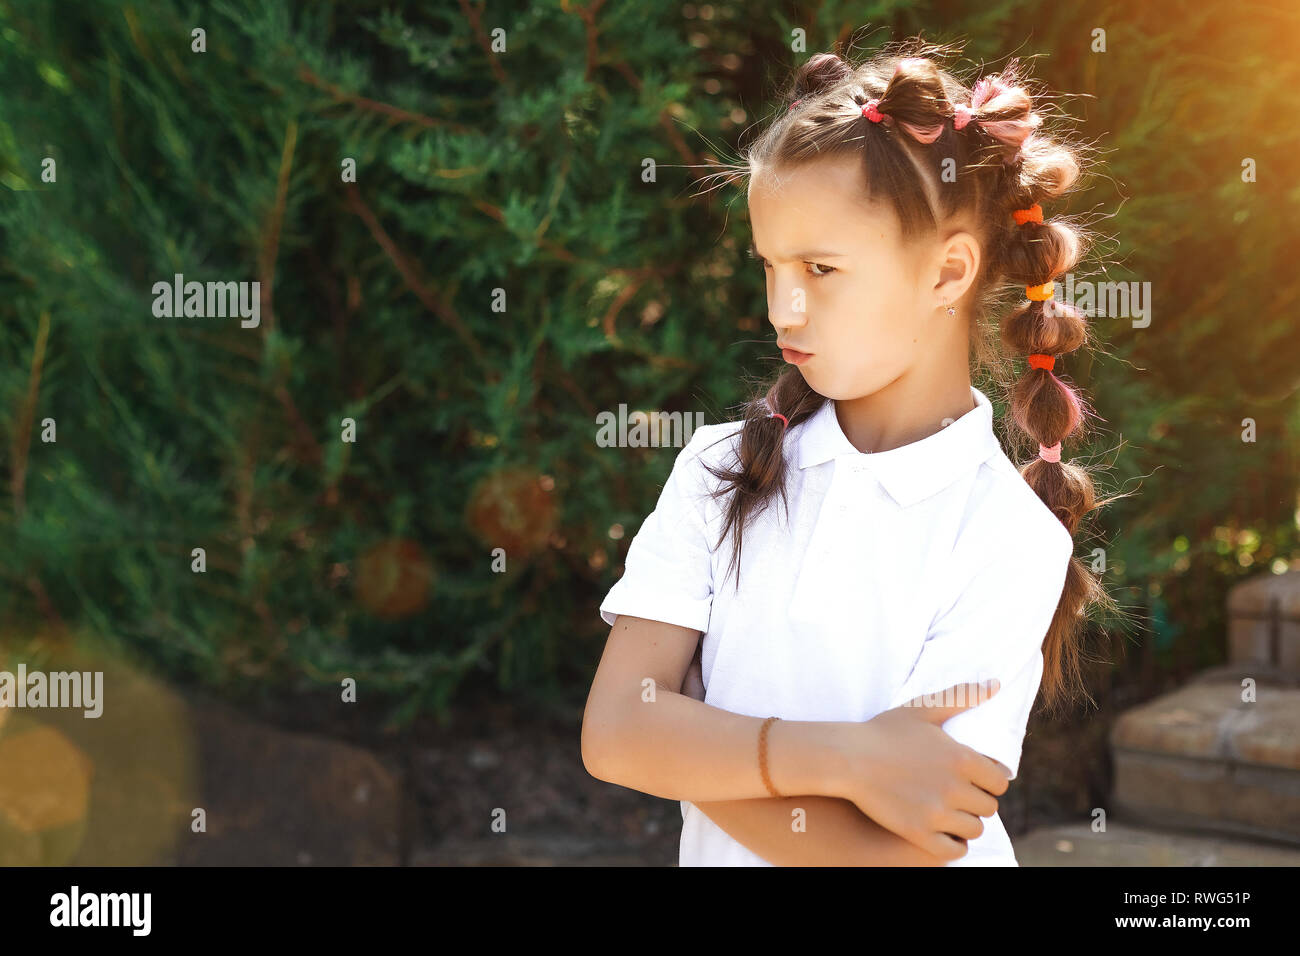 angry child girl - Stock Image